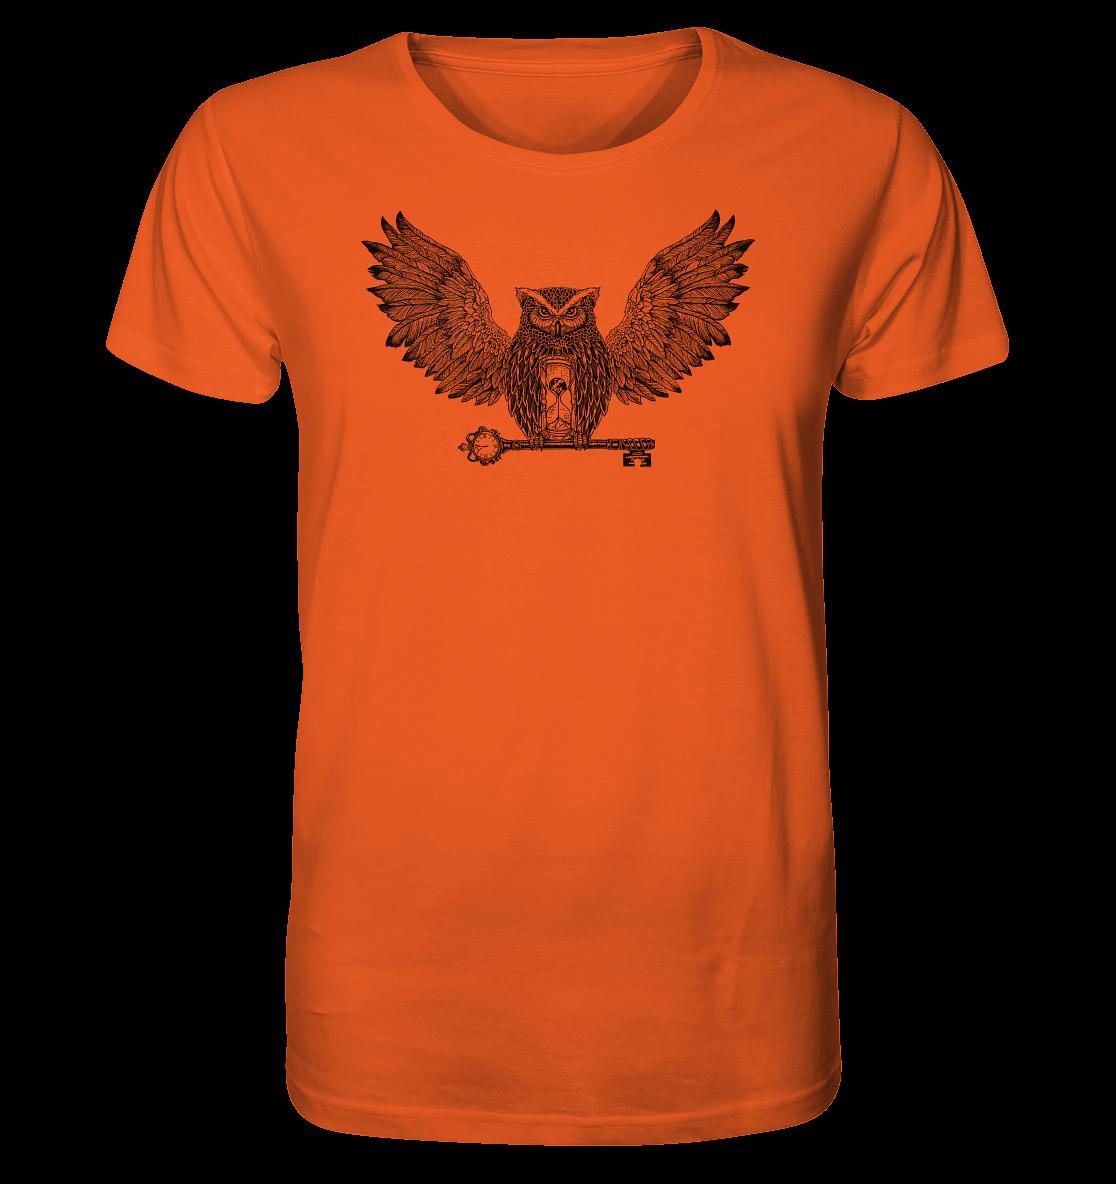 front-organic-shirt-ea5b23-1116x-9.png